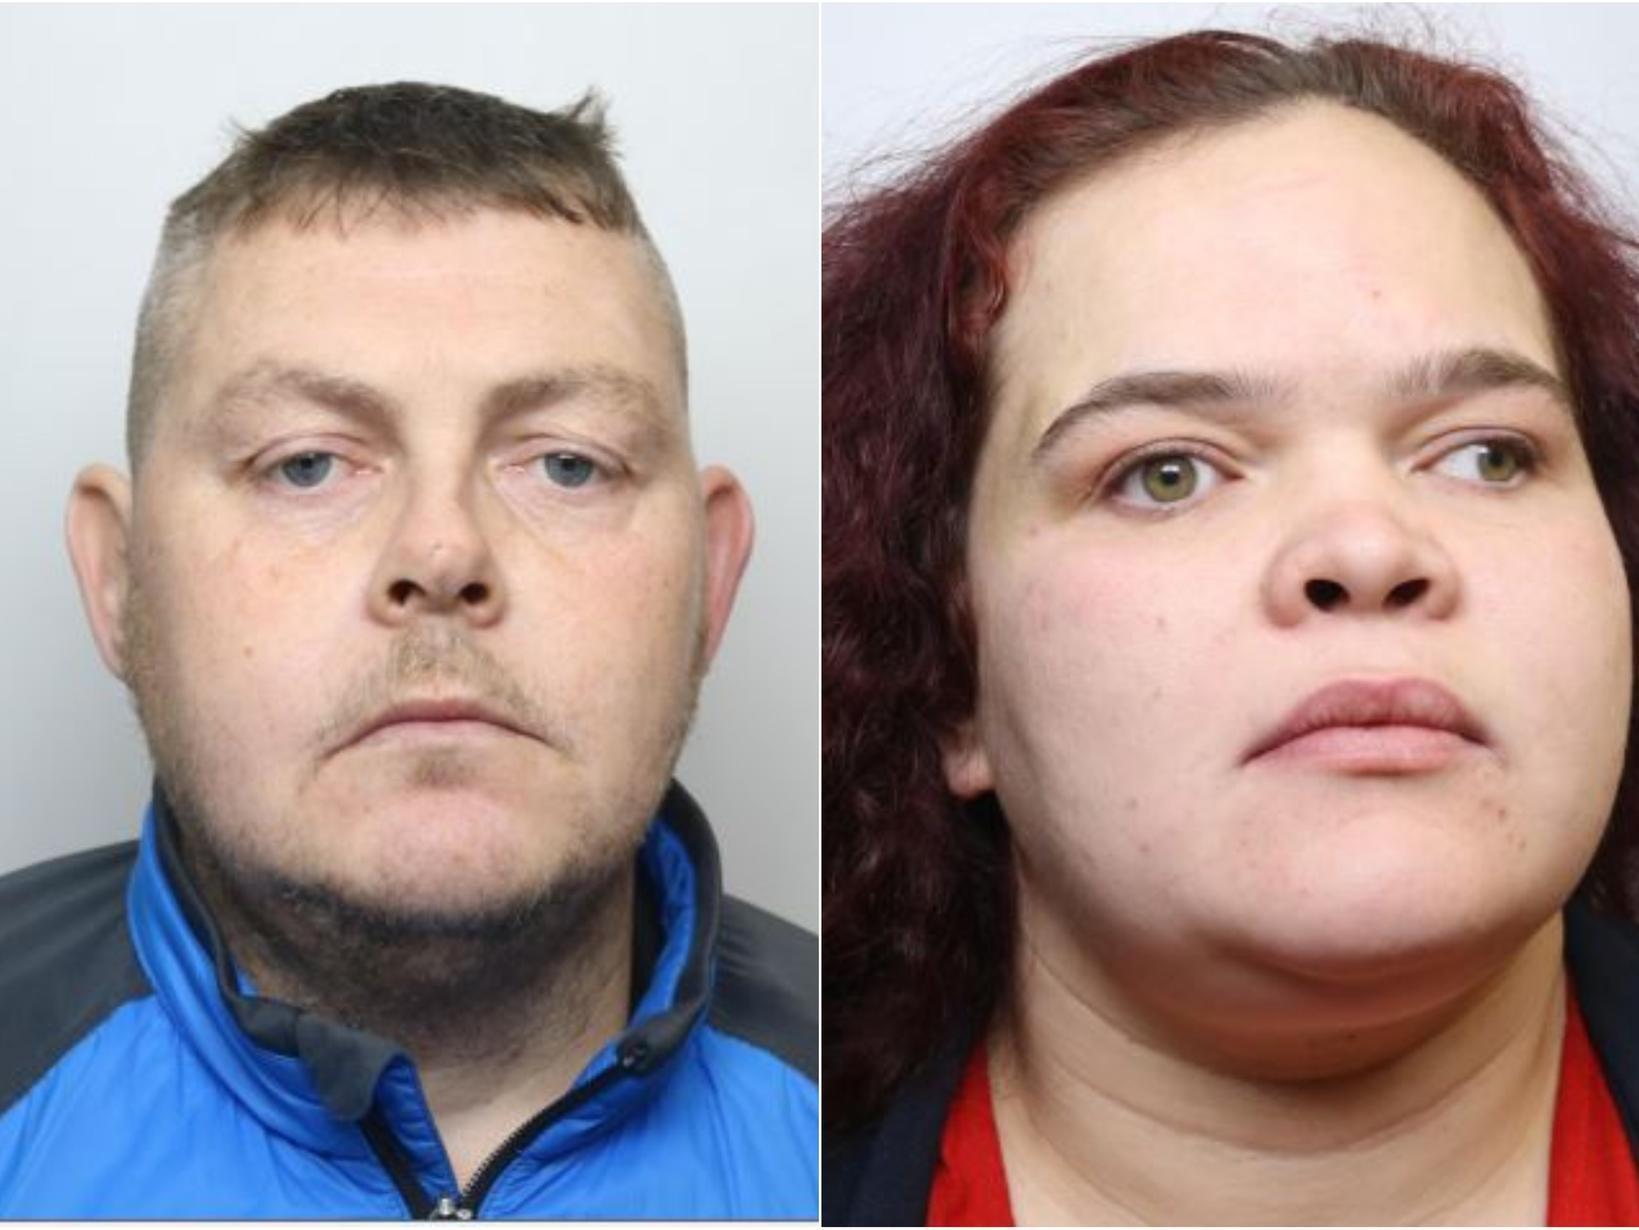 Police concerned for missing nine-month-old baby from Leeds